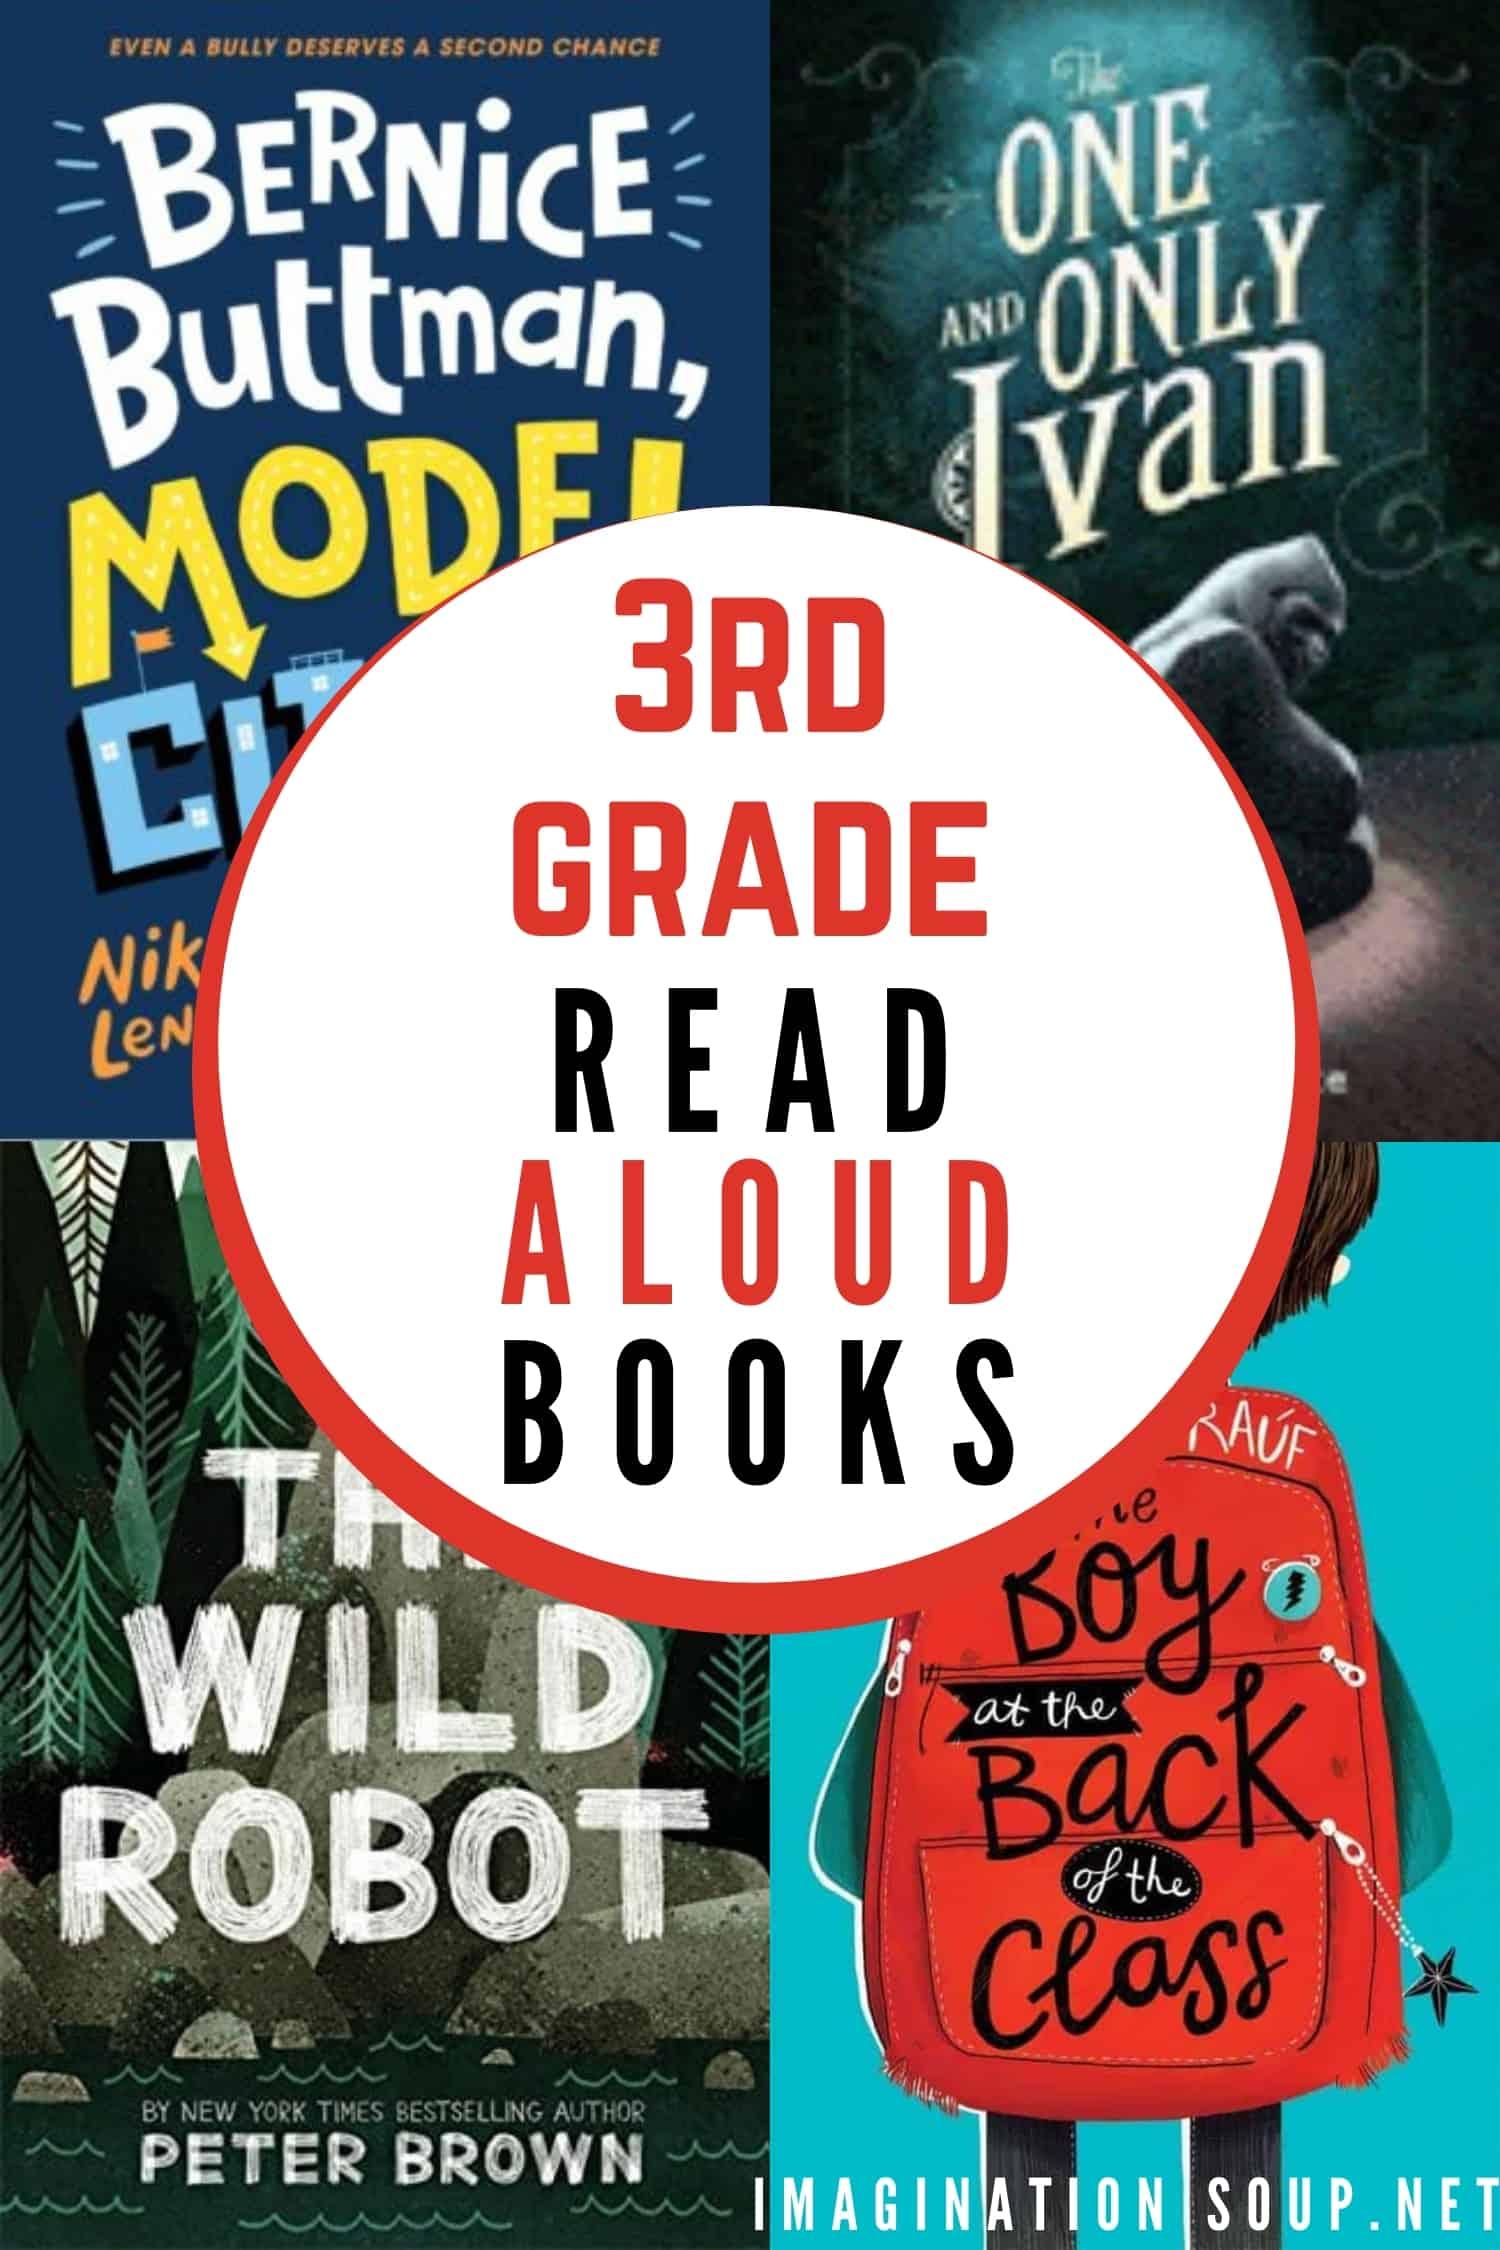 3rd grade read aloud books